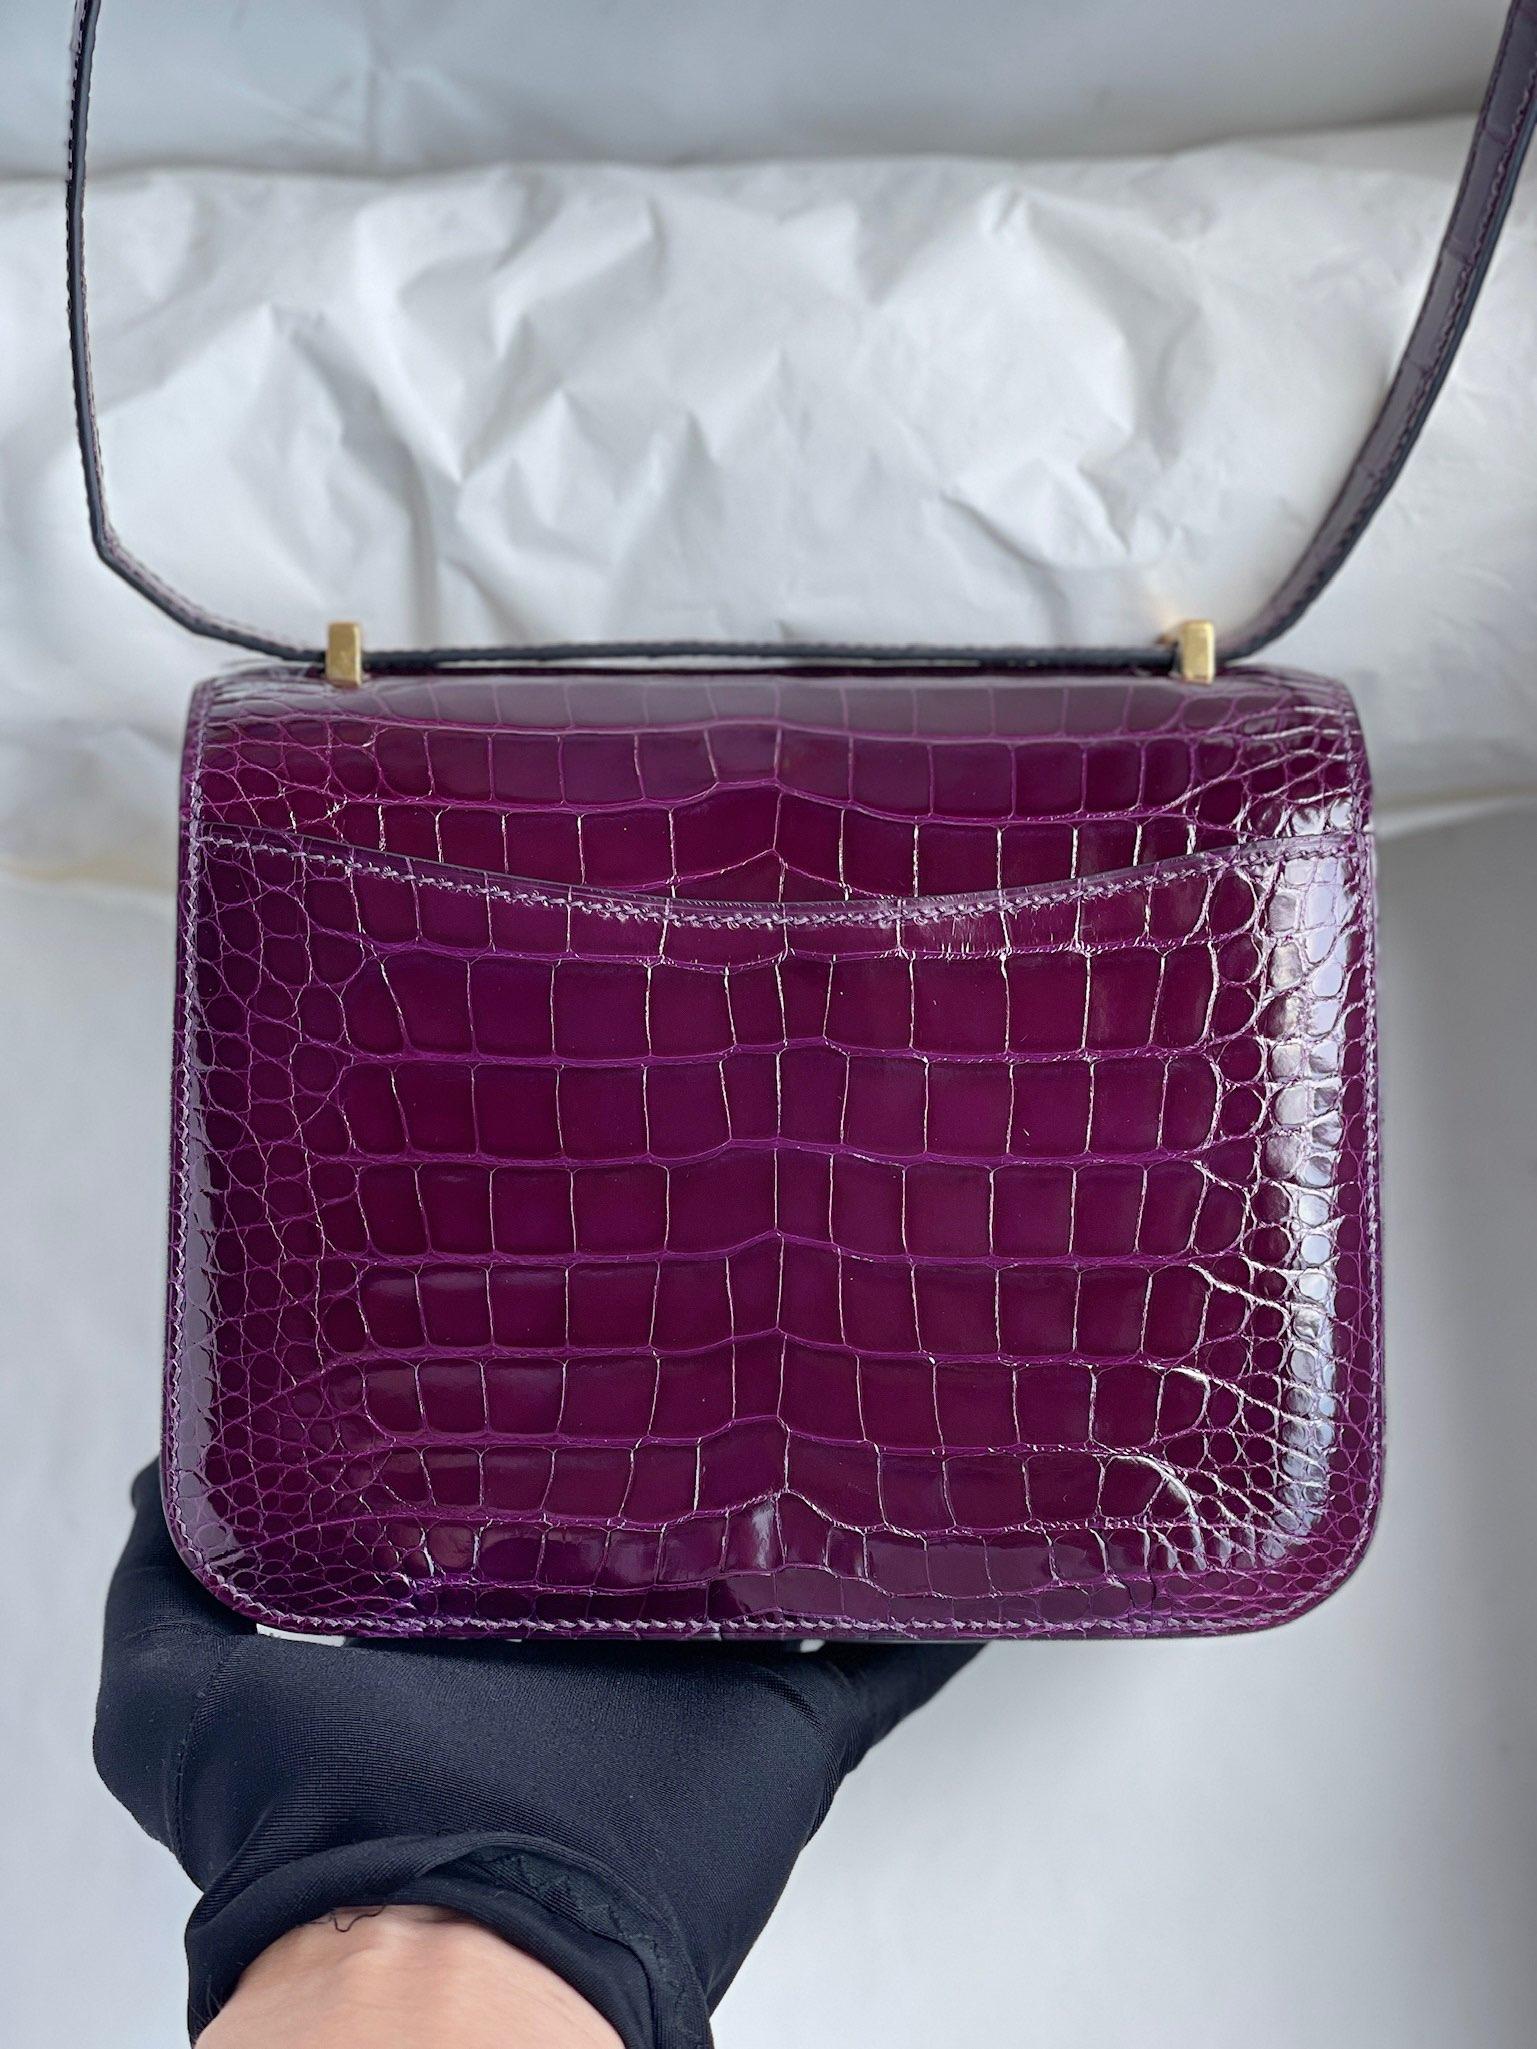 Hermès(爱马仕)Constance 康斯坦斯 Alligator shiny 亮面鳄鱼 玫瑰紫 金扣 18cm 顶级手缝 定制